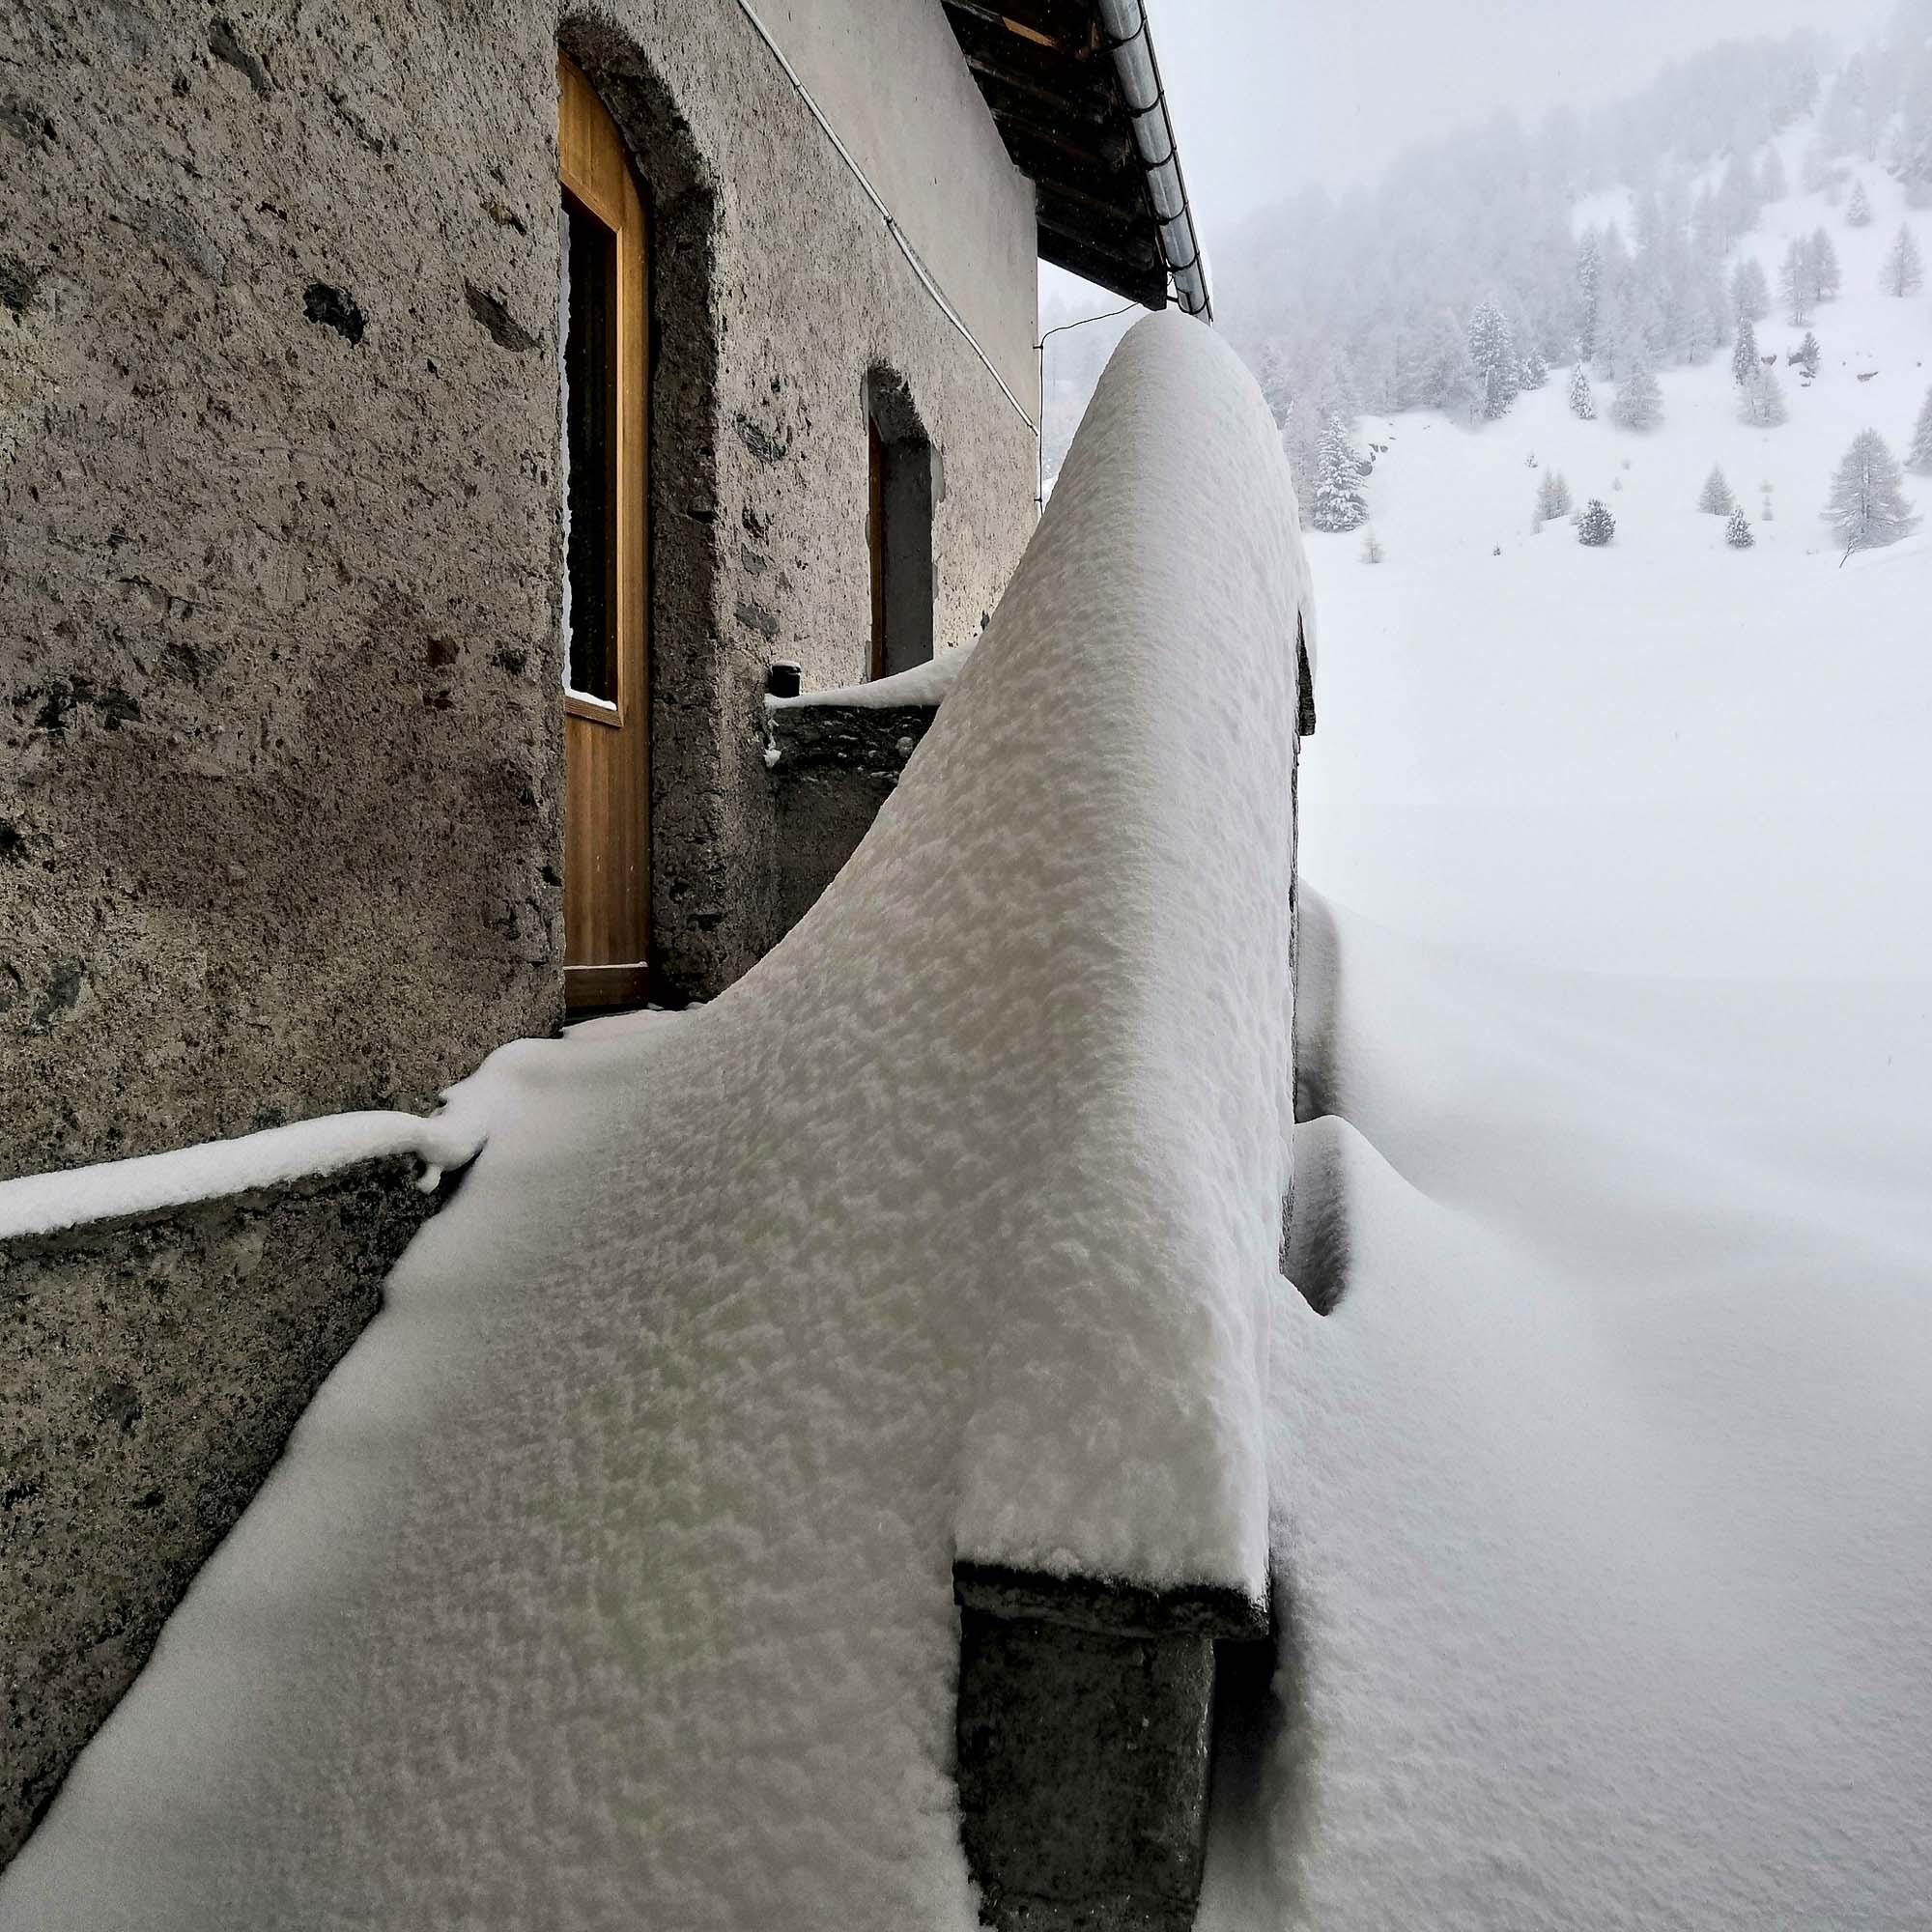 ylz / Schneetreppe